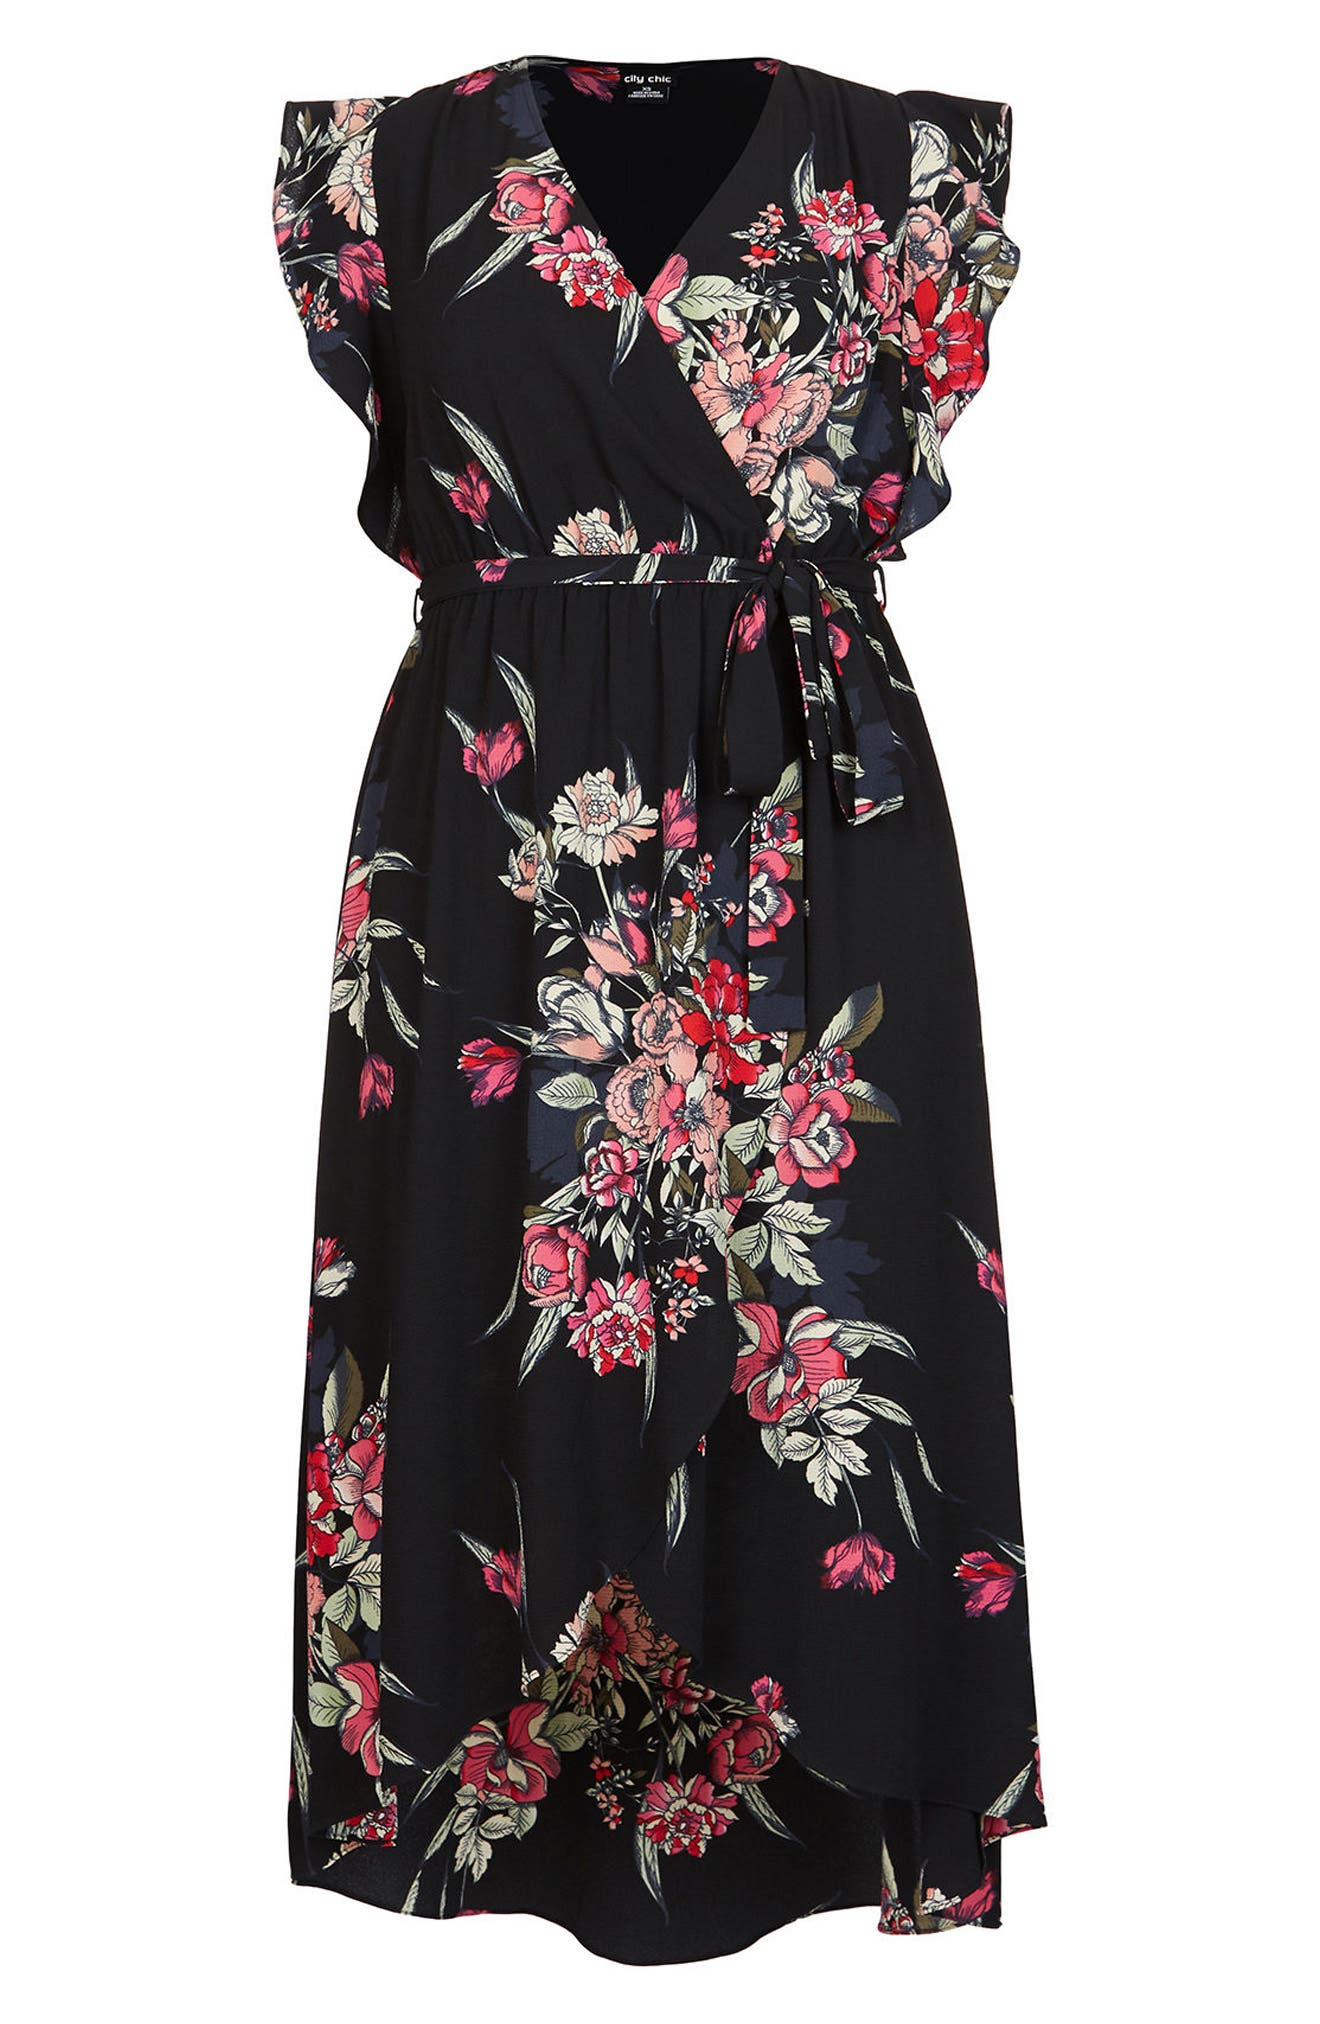 CITY CHIC, Misty Floral Wrap Maxi Dress, Alternate thumbnail 2, color, MISTY FLORAL